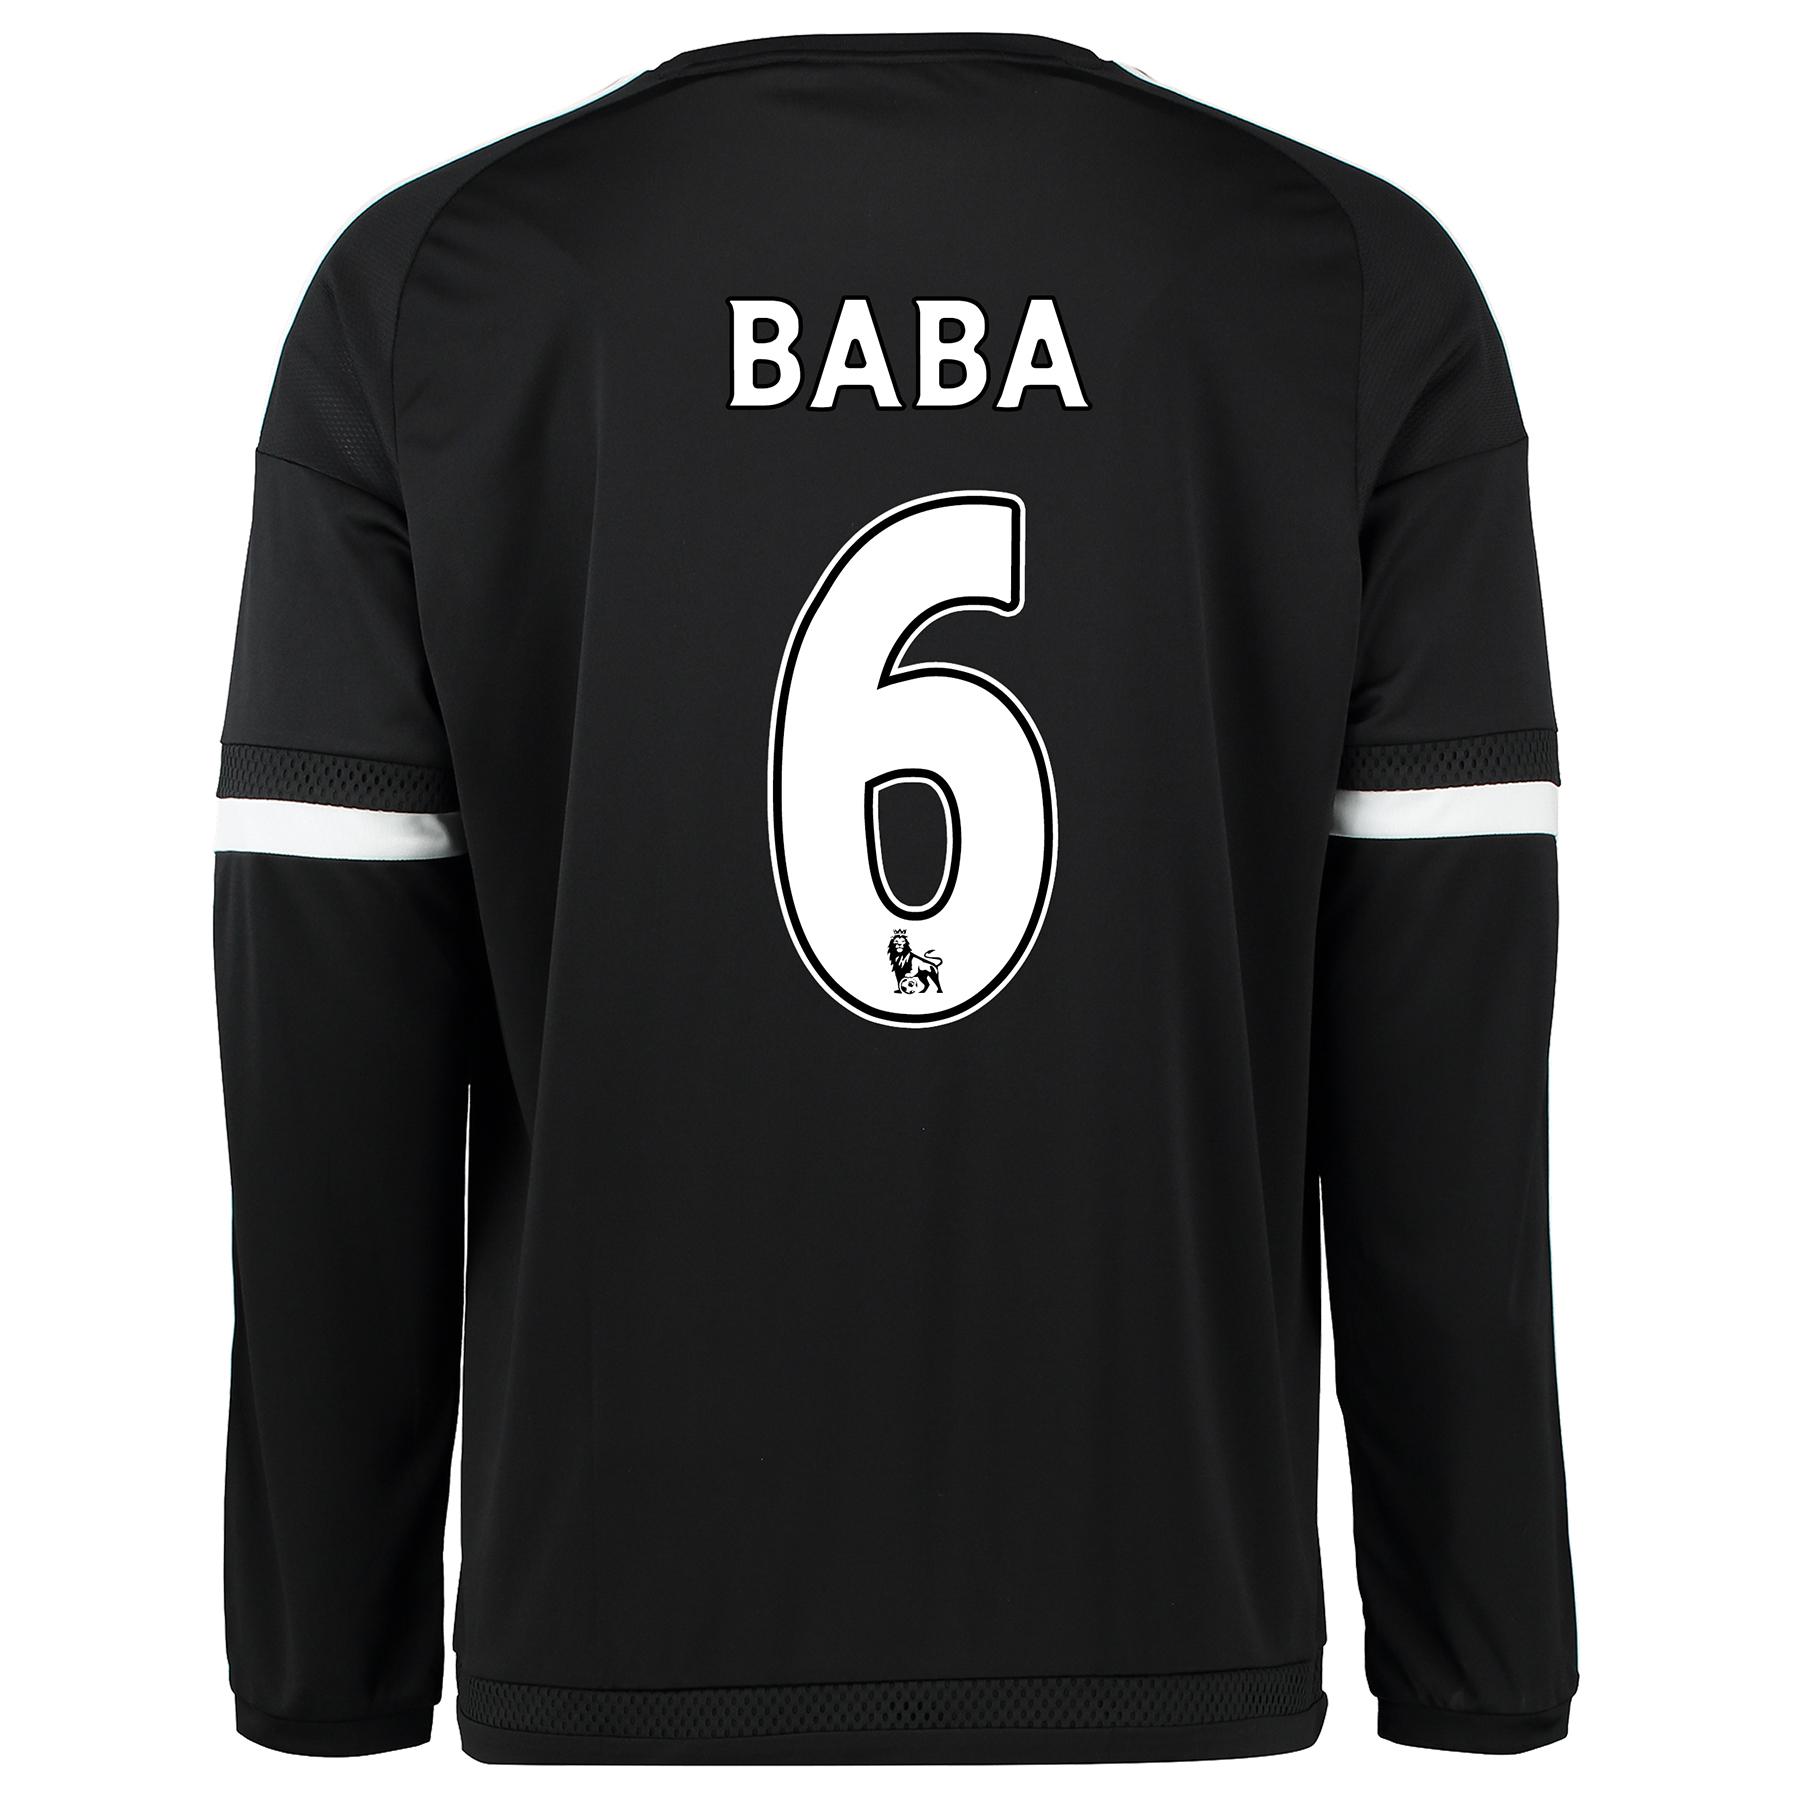 Chelsea Third Shirt 2015/16 - Long Sleeve Black with Baba 6 printing